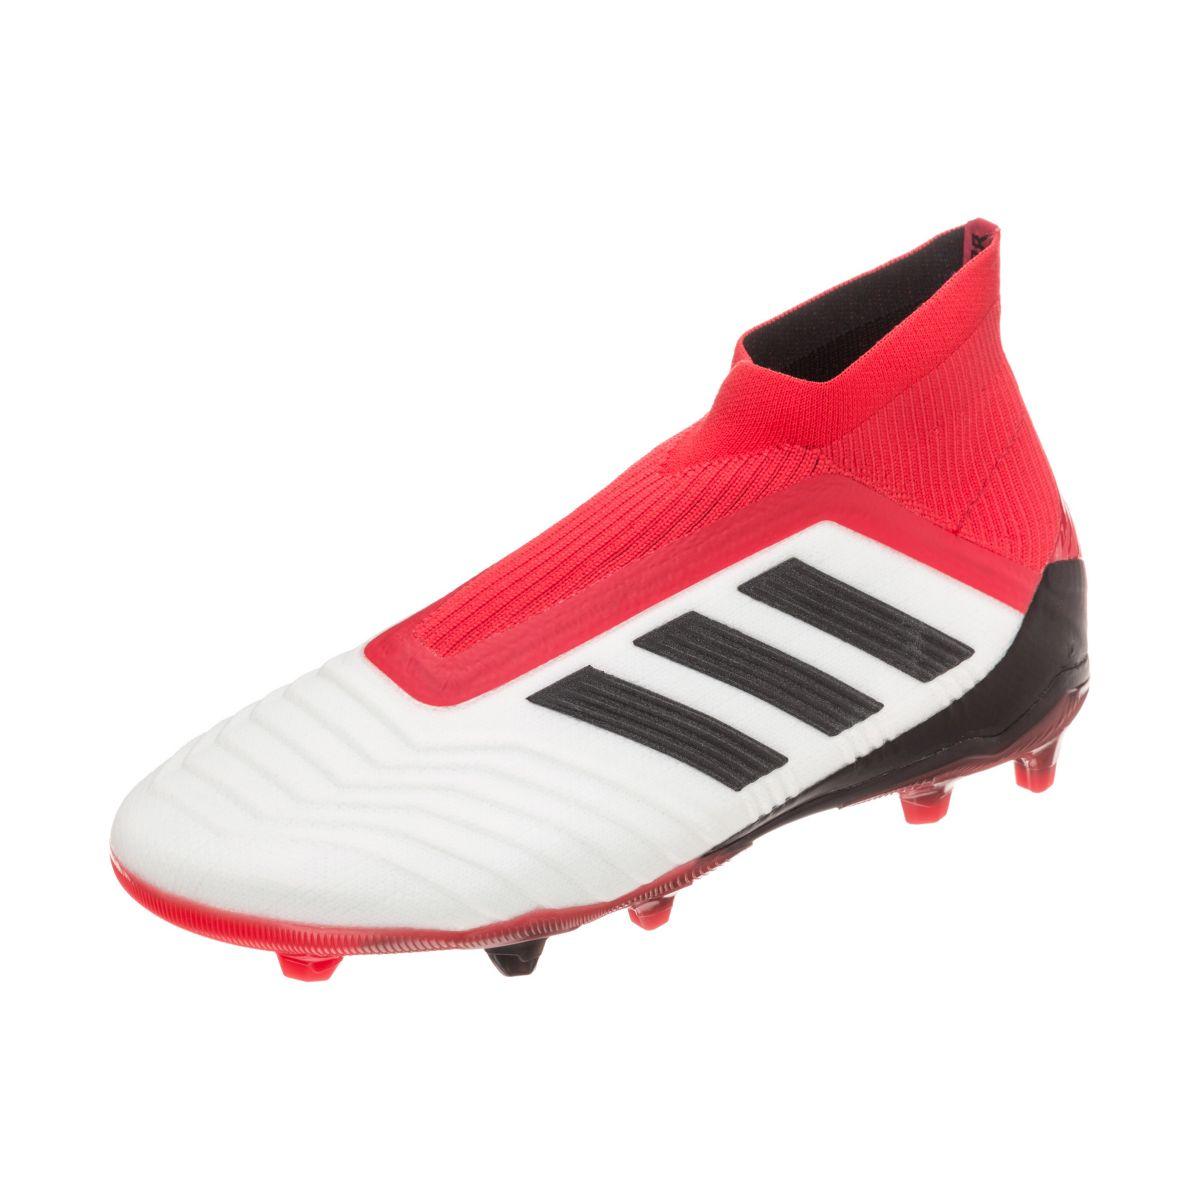 adidas Performance Fußballschuh »Predator 18«